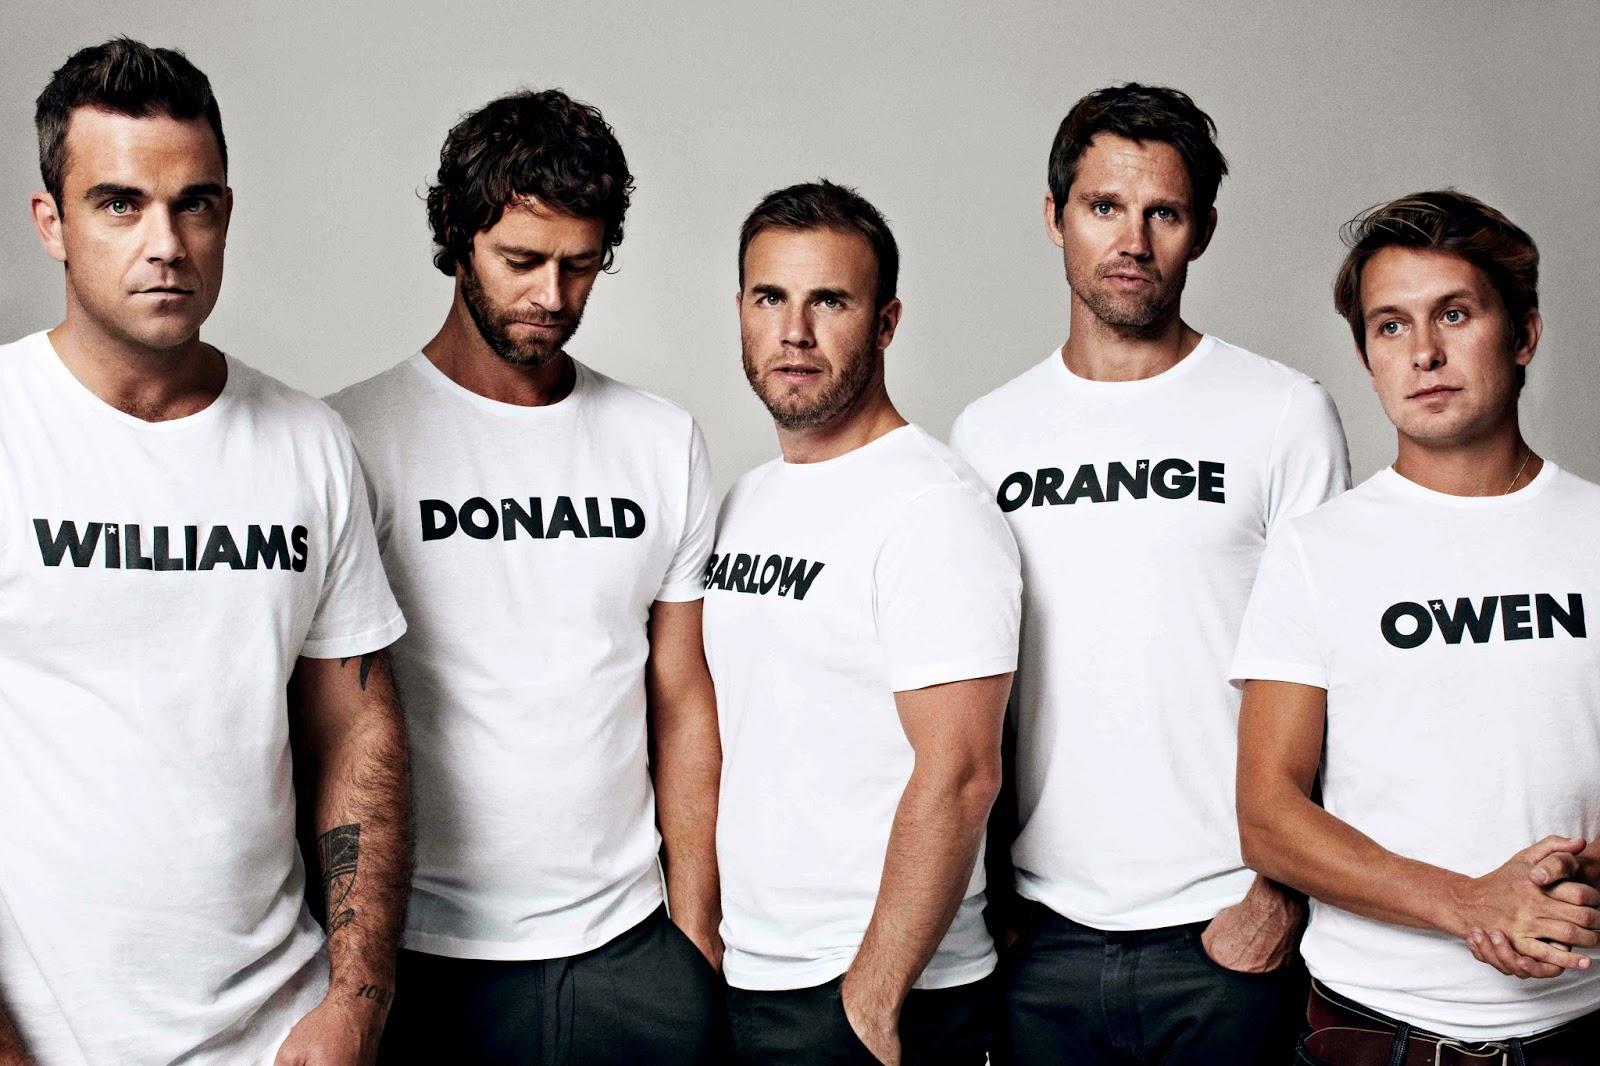 howard donald, jason orange, gary barlow, mark owen, take that, abandono, el zorro con gafas